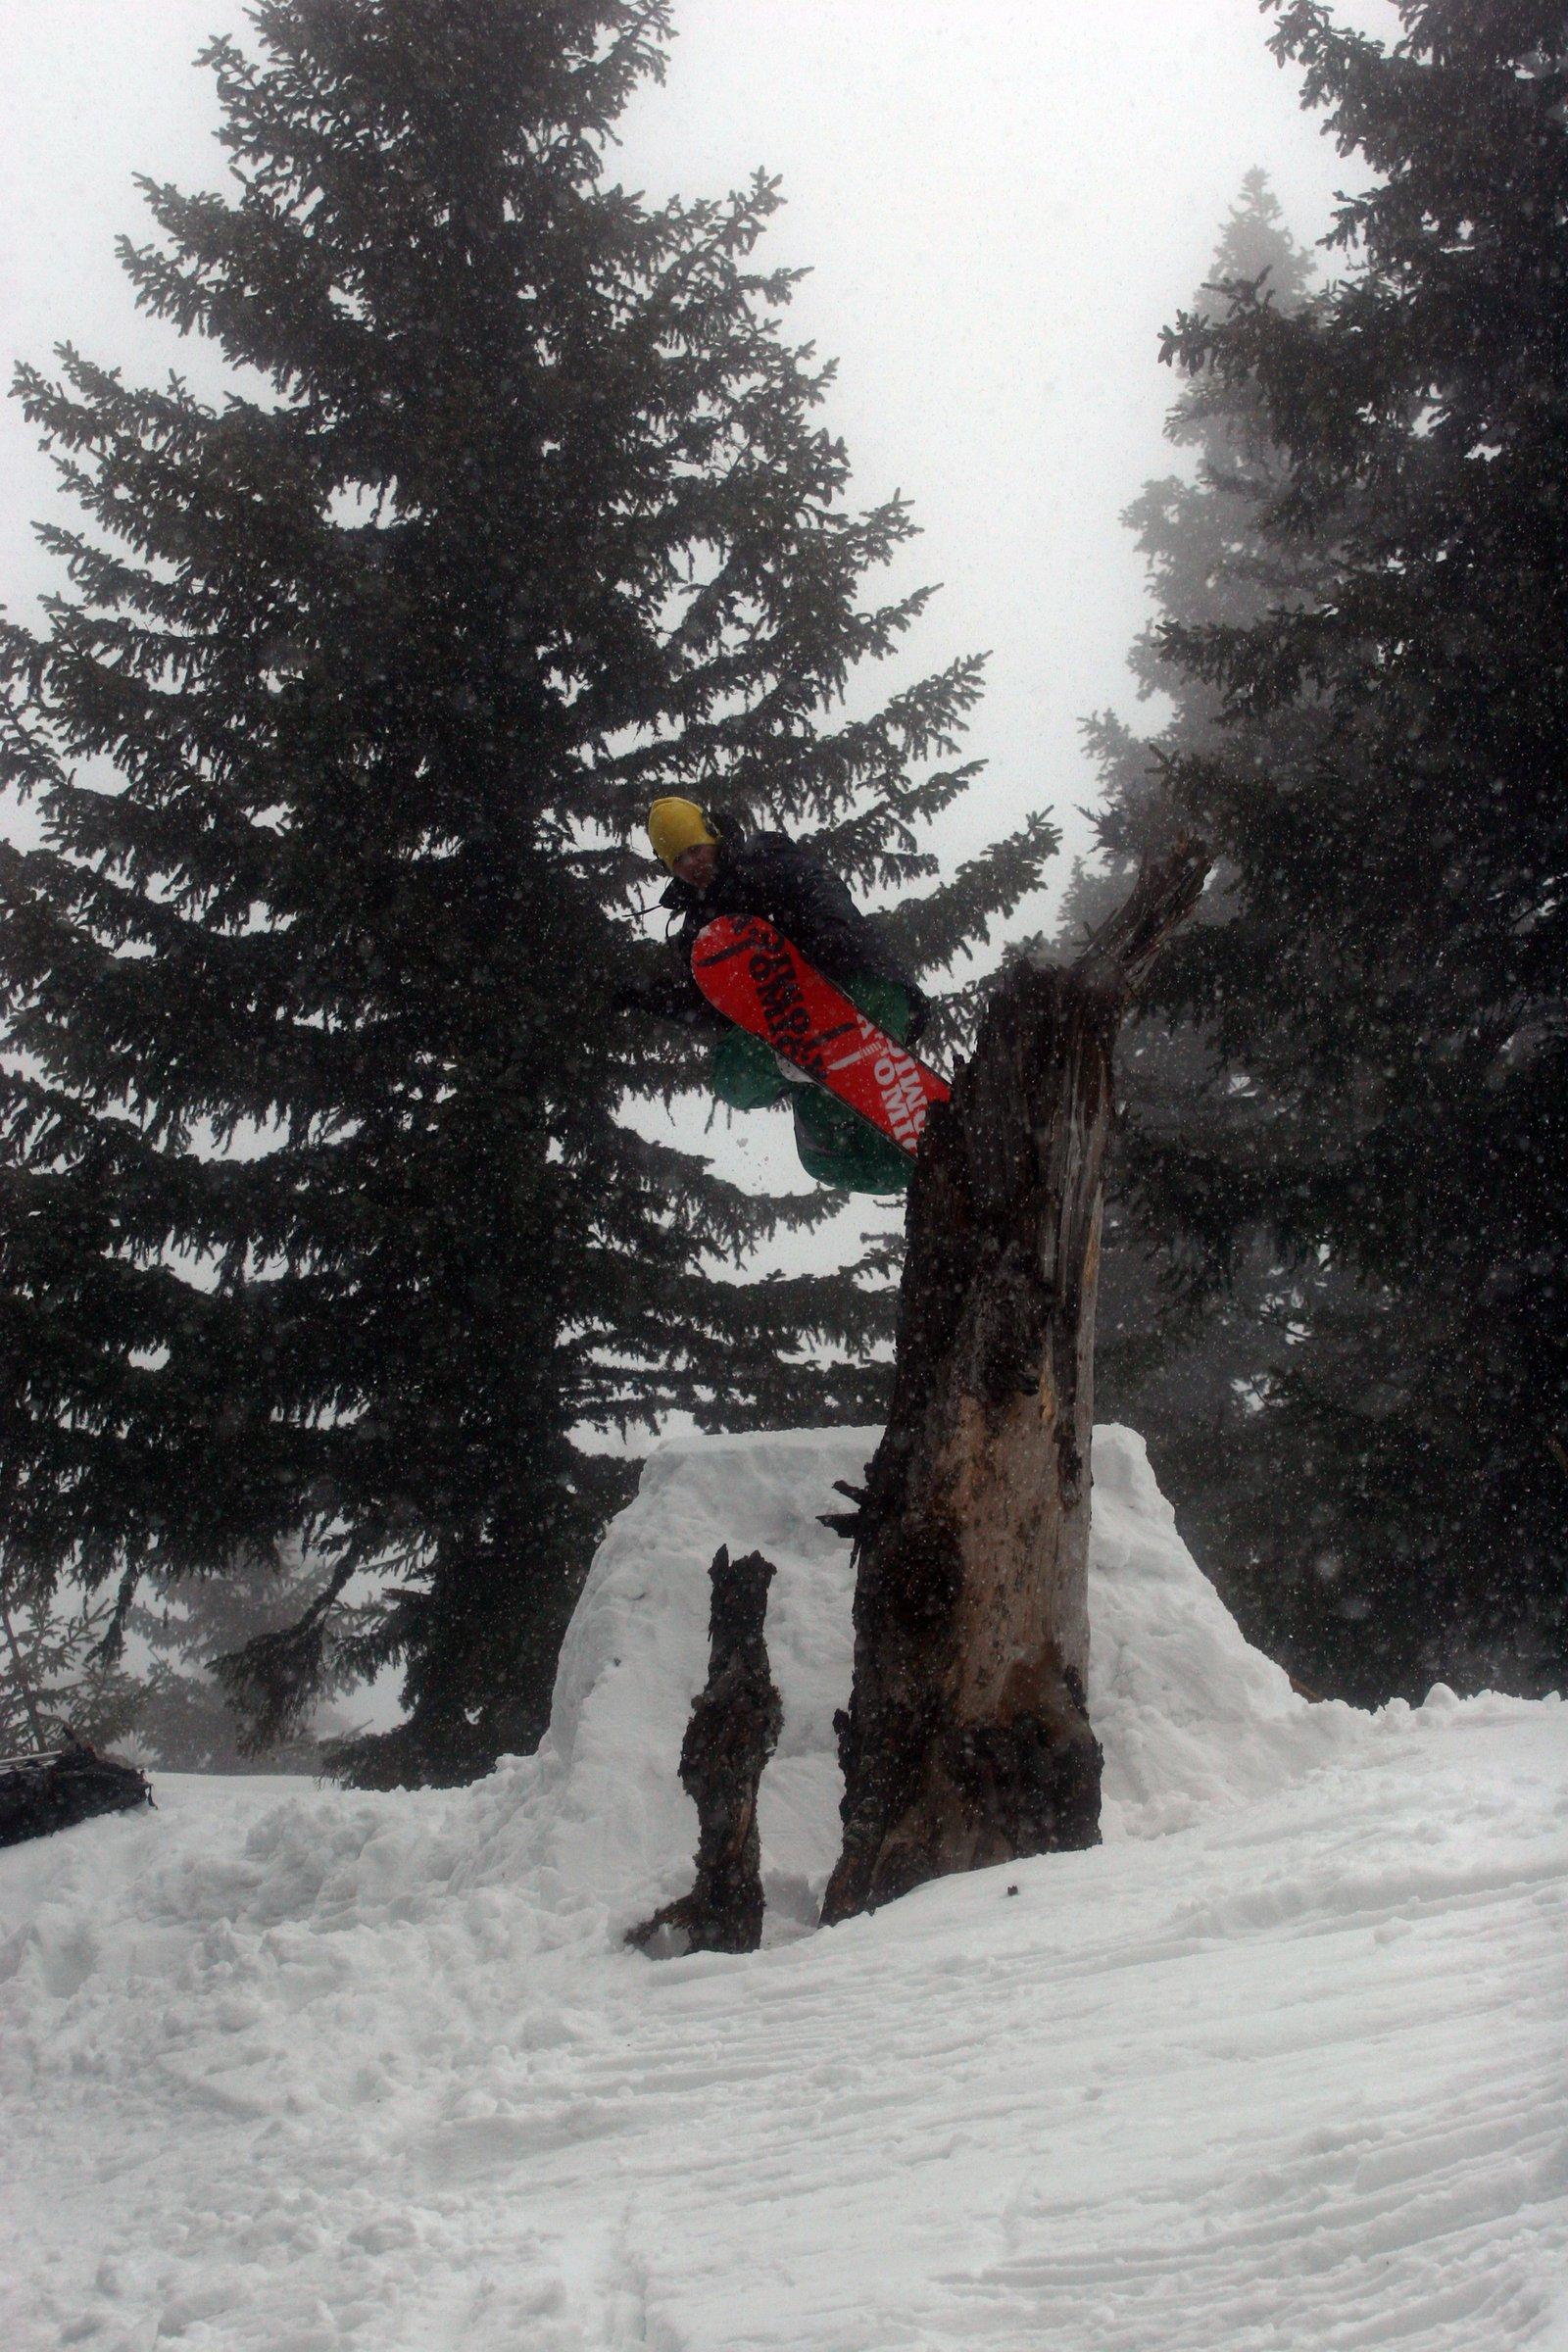 Snowboard treebonk #3